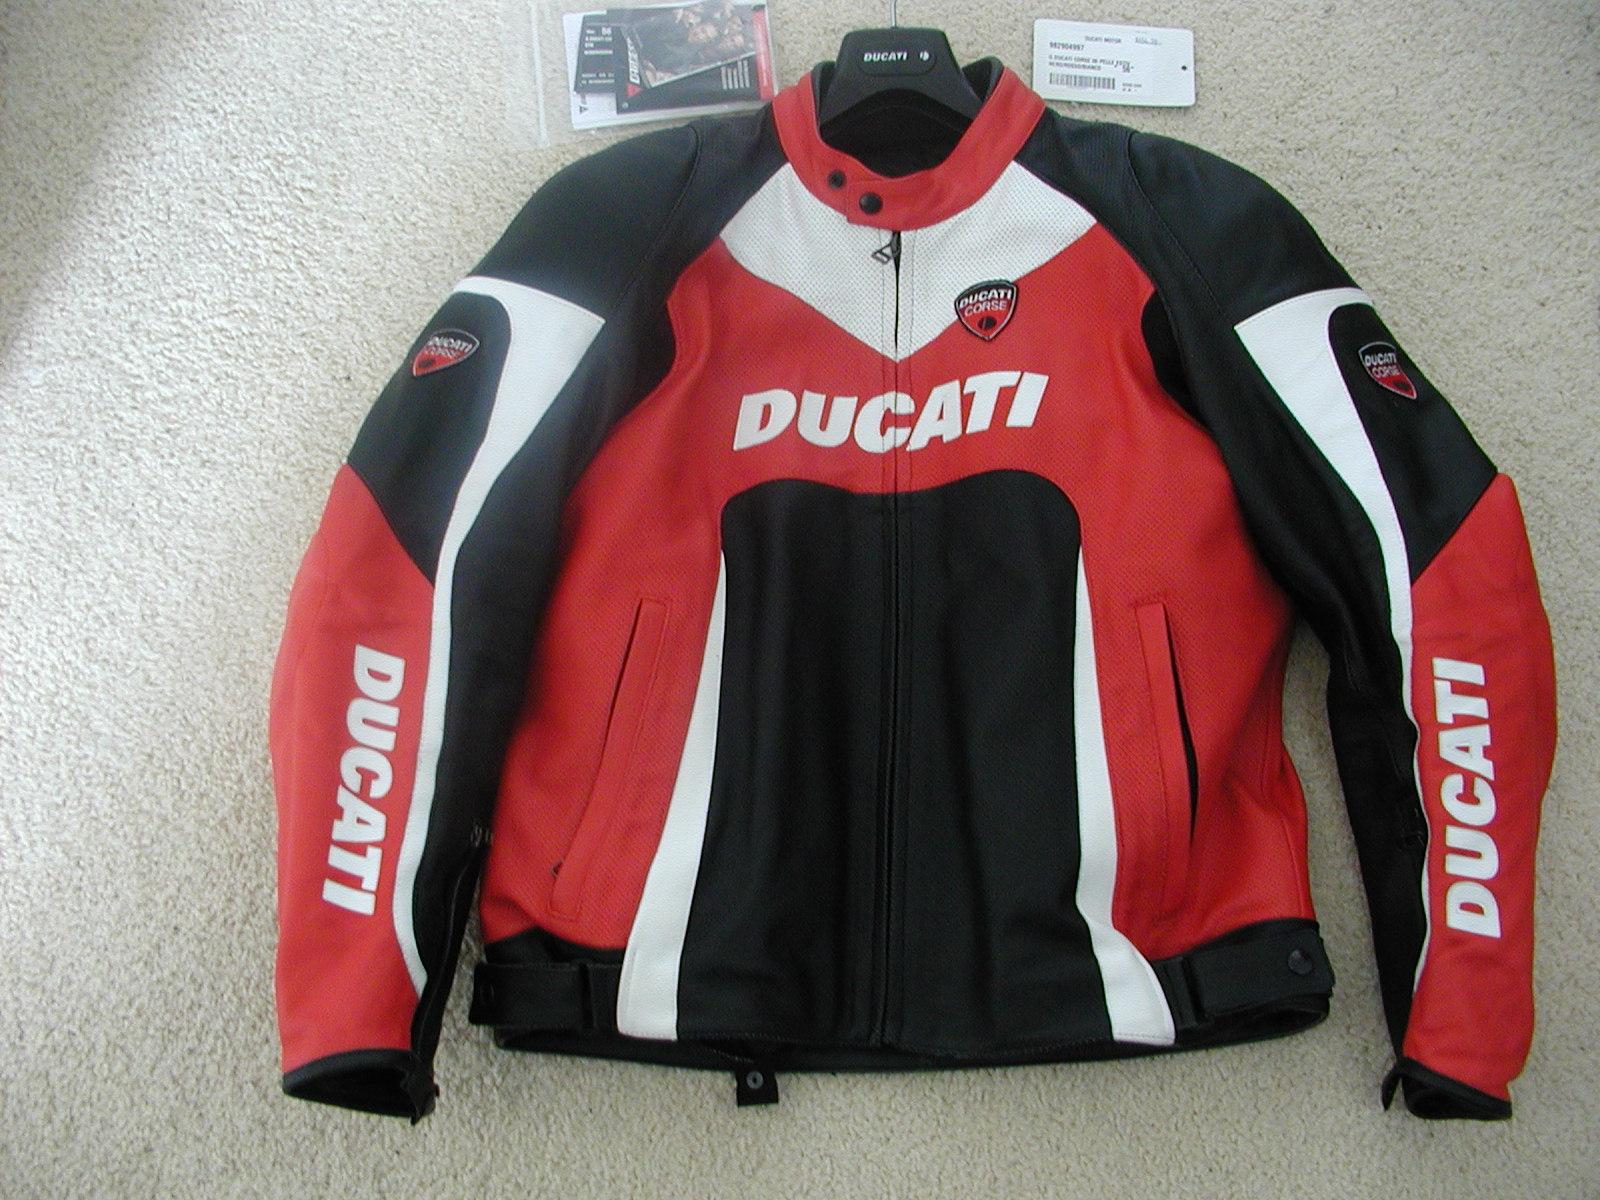 fs dainese ducati corse leather jacket size 46us - ducati